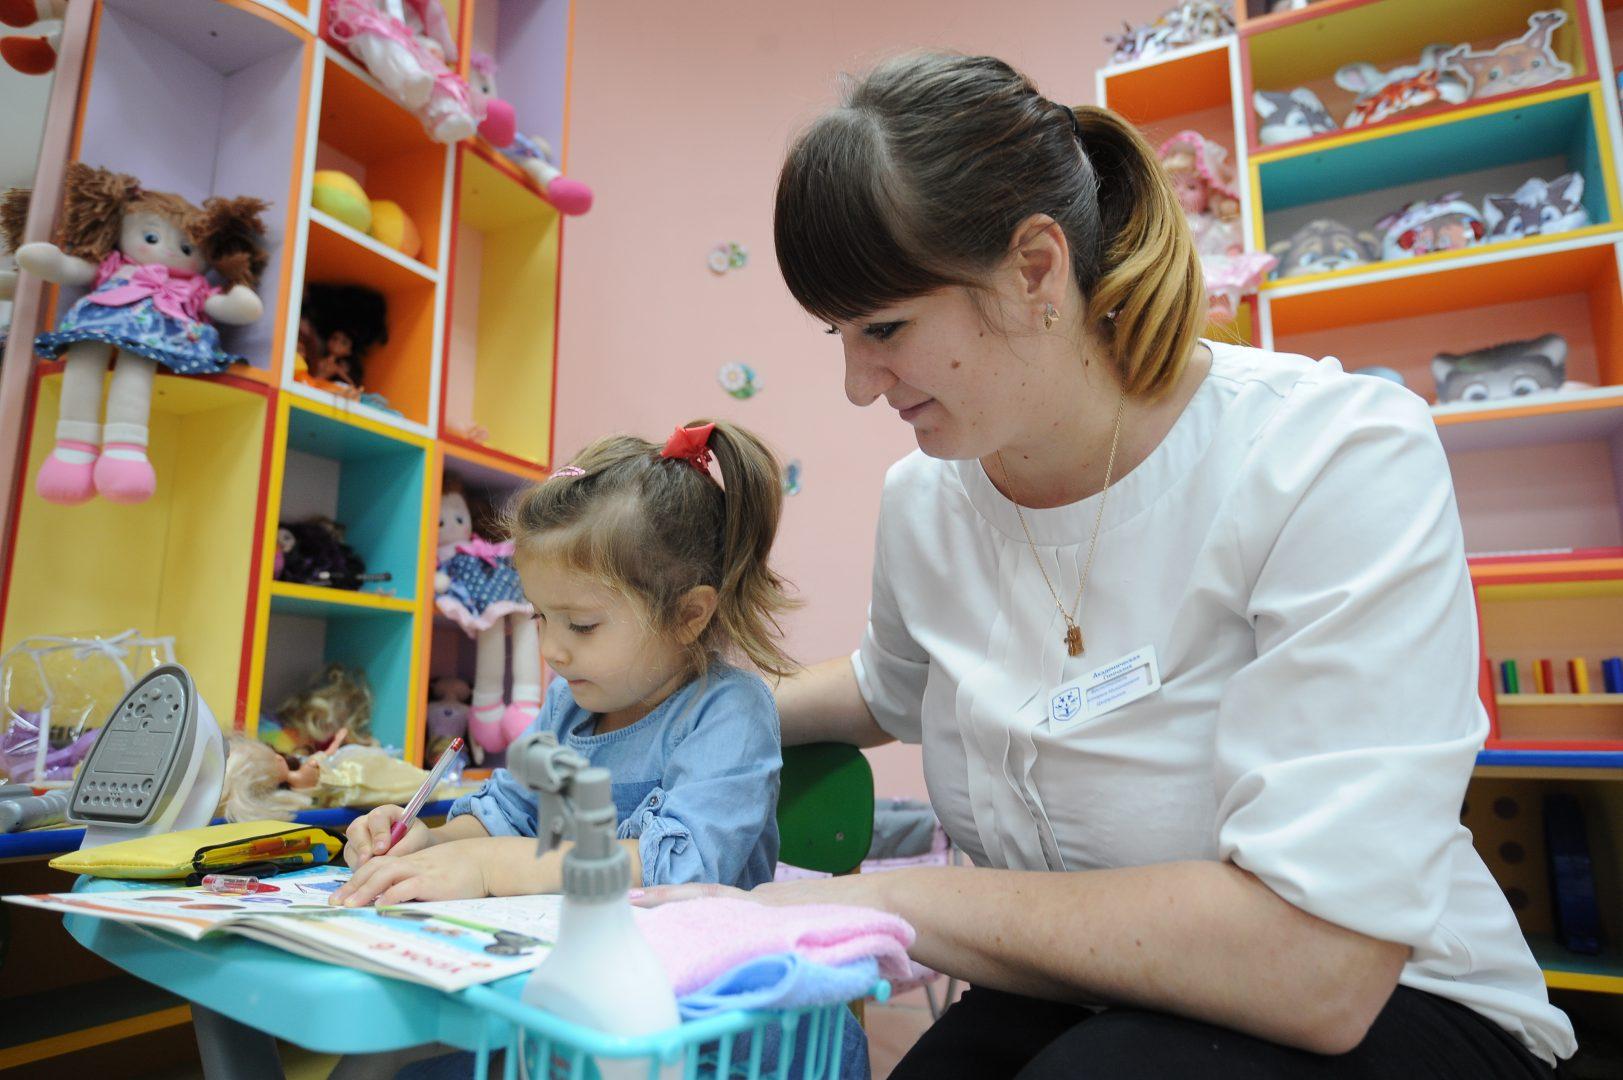 Дети хорошо усвоили материал. Фото: Пелагия Замятина, «Вечерняя Москва»